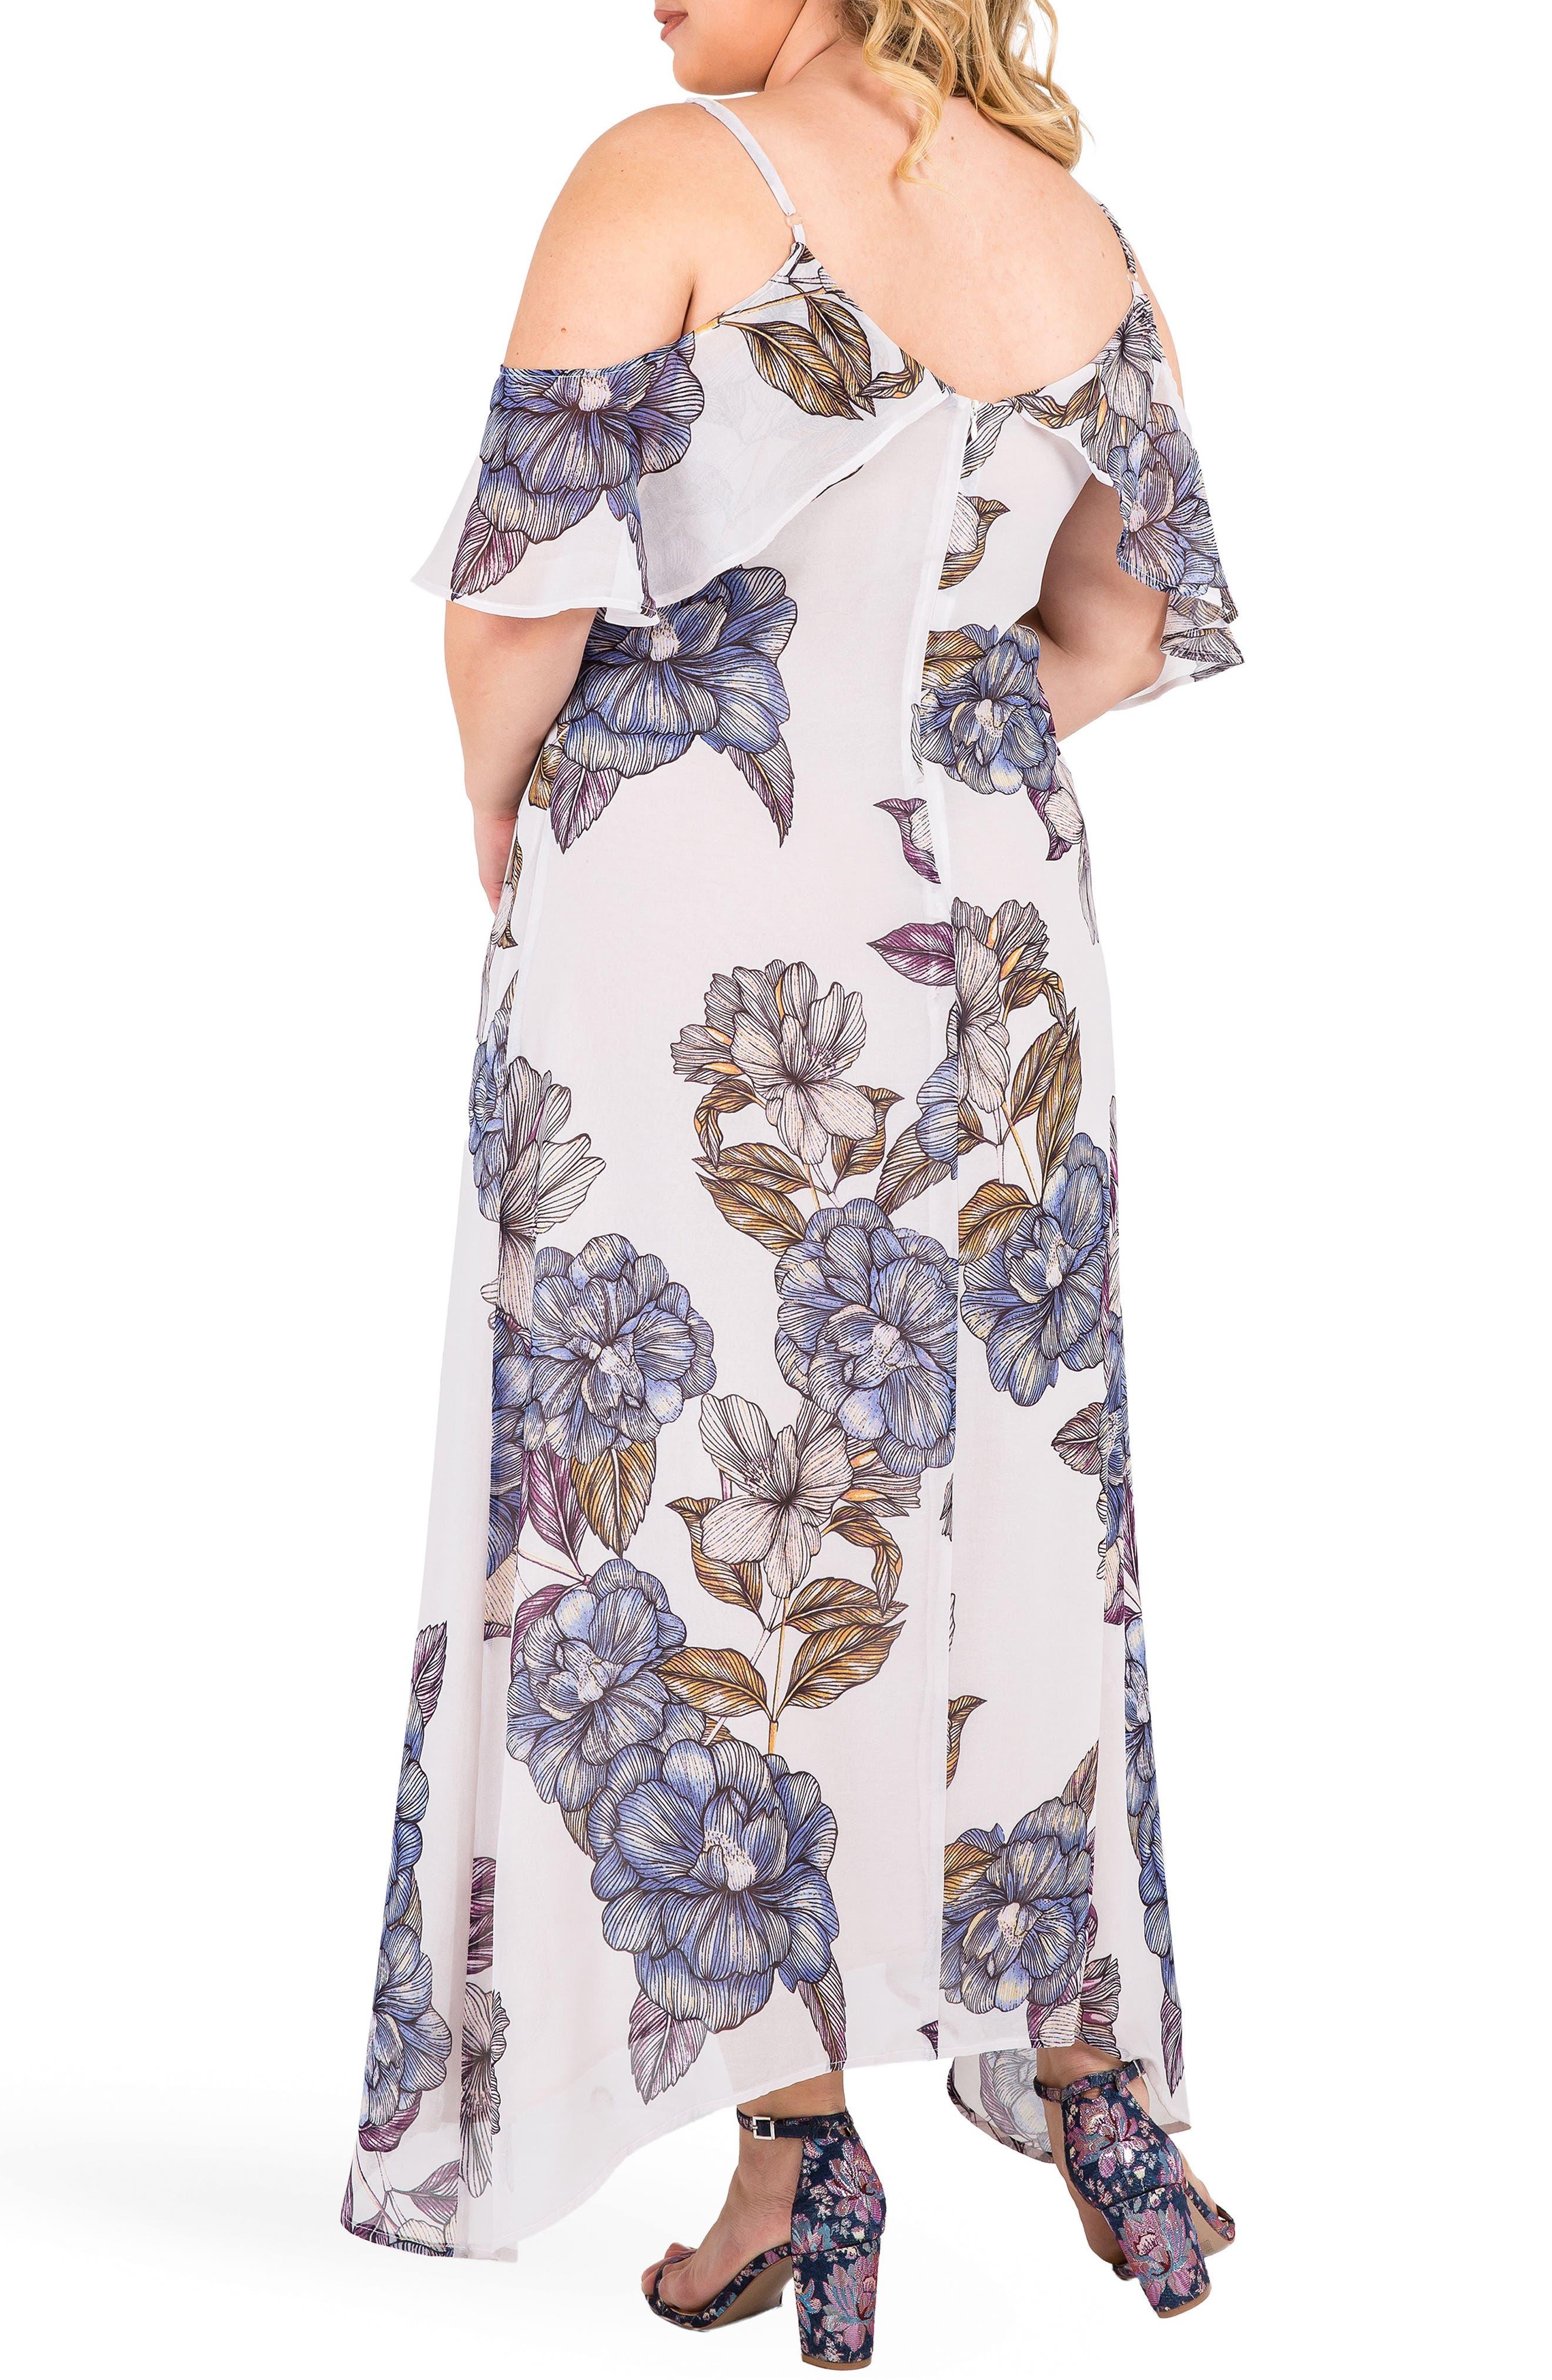 Matilda Floral Cold Shoulder Maxi Dress,                             Alternate thumbnail 2, color,                             Light Gray Floral Print